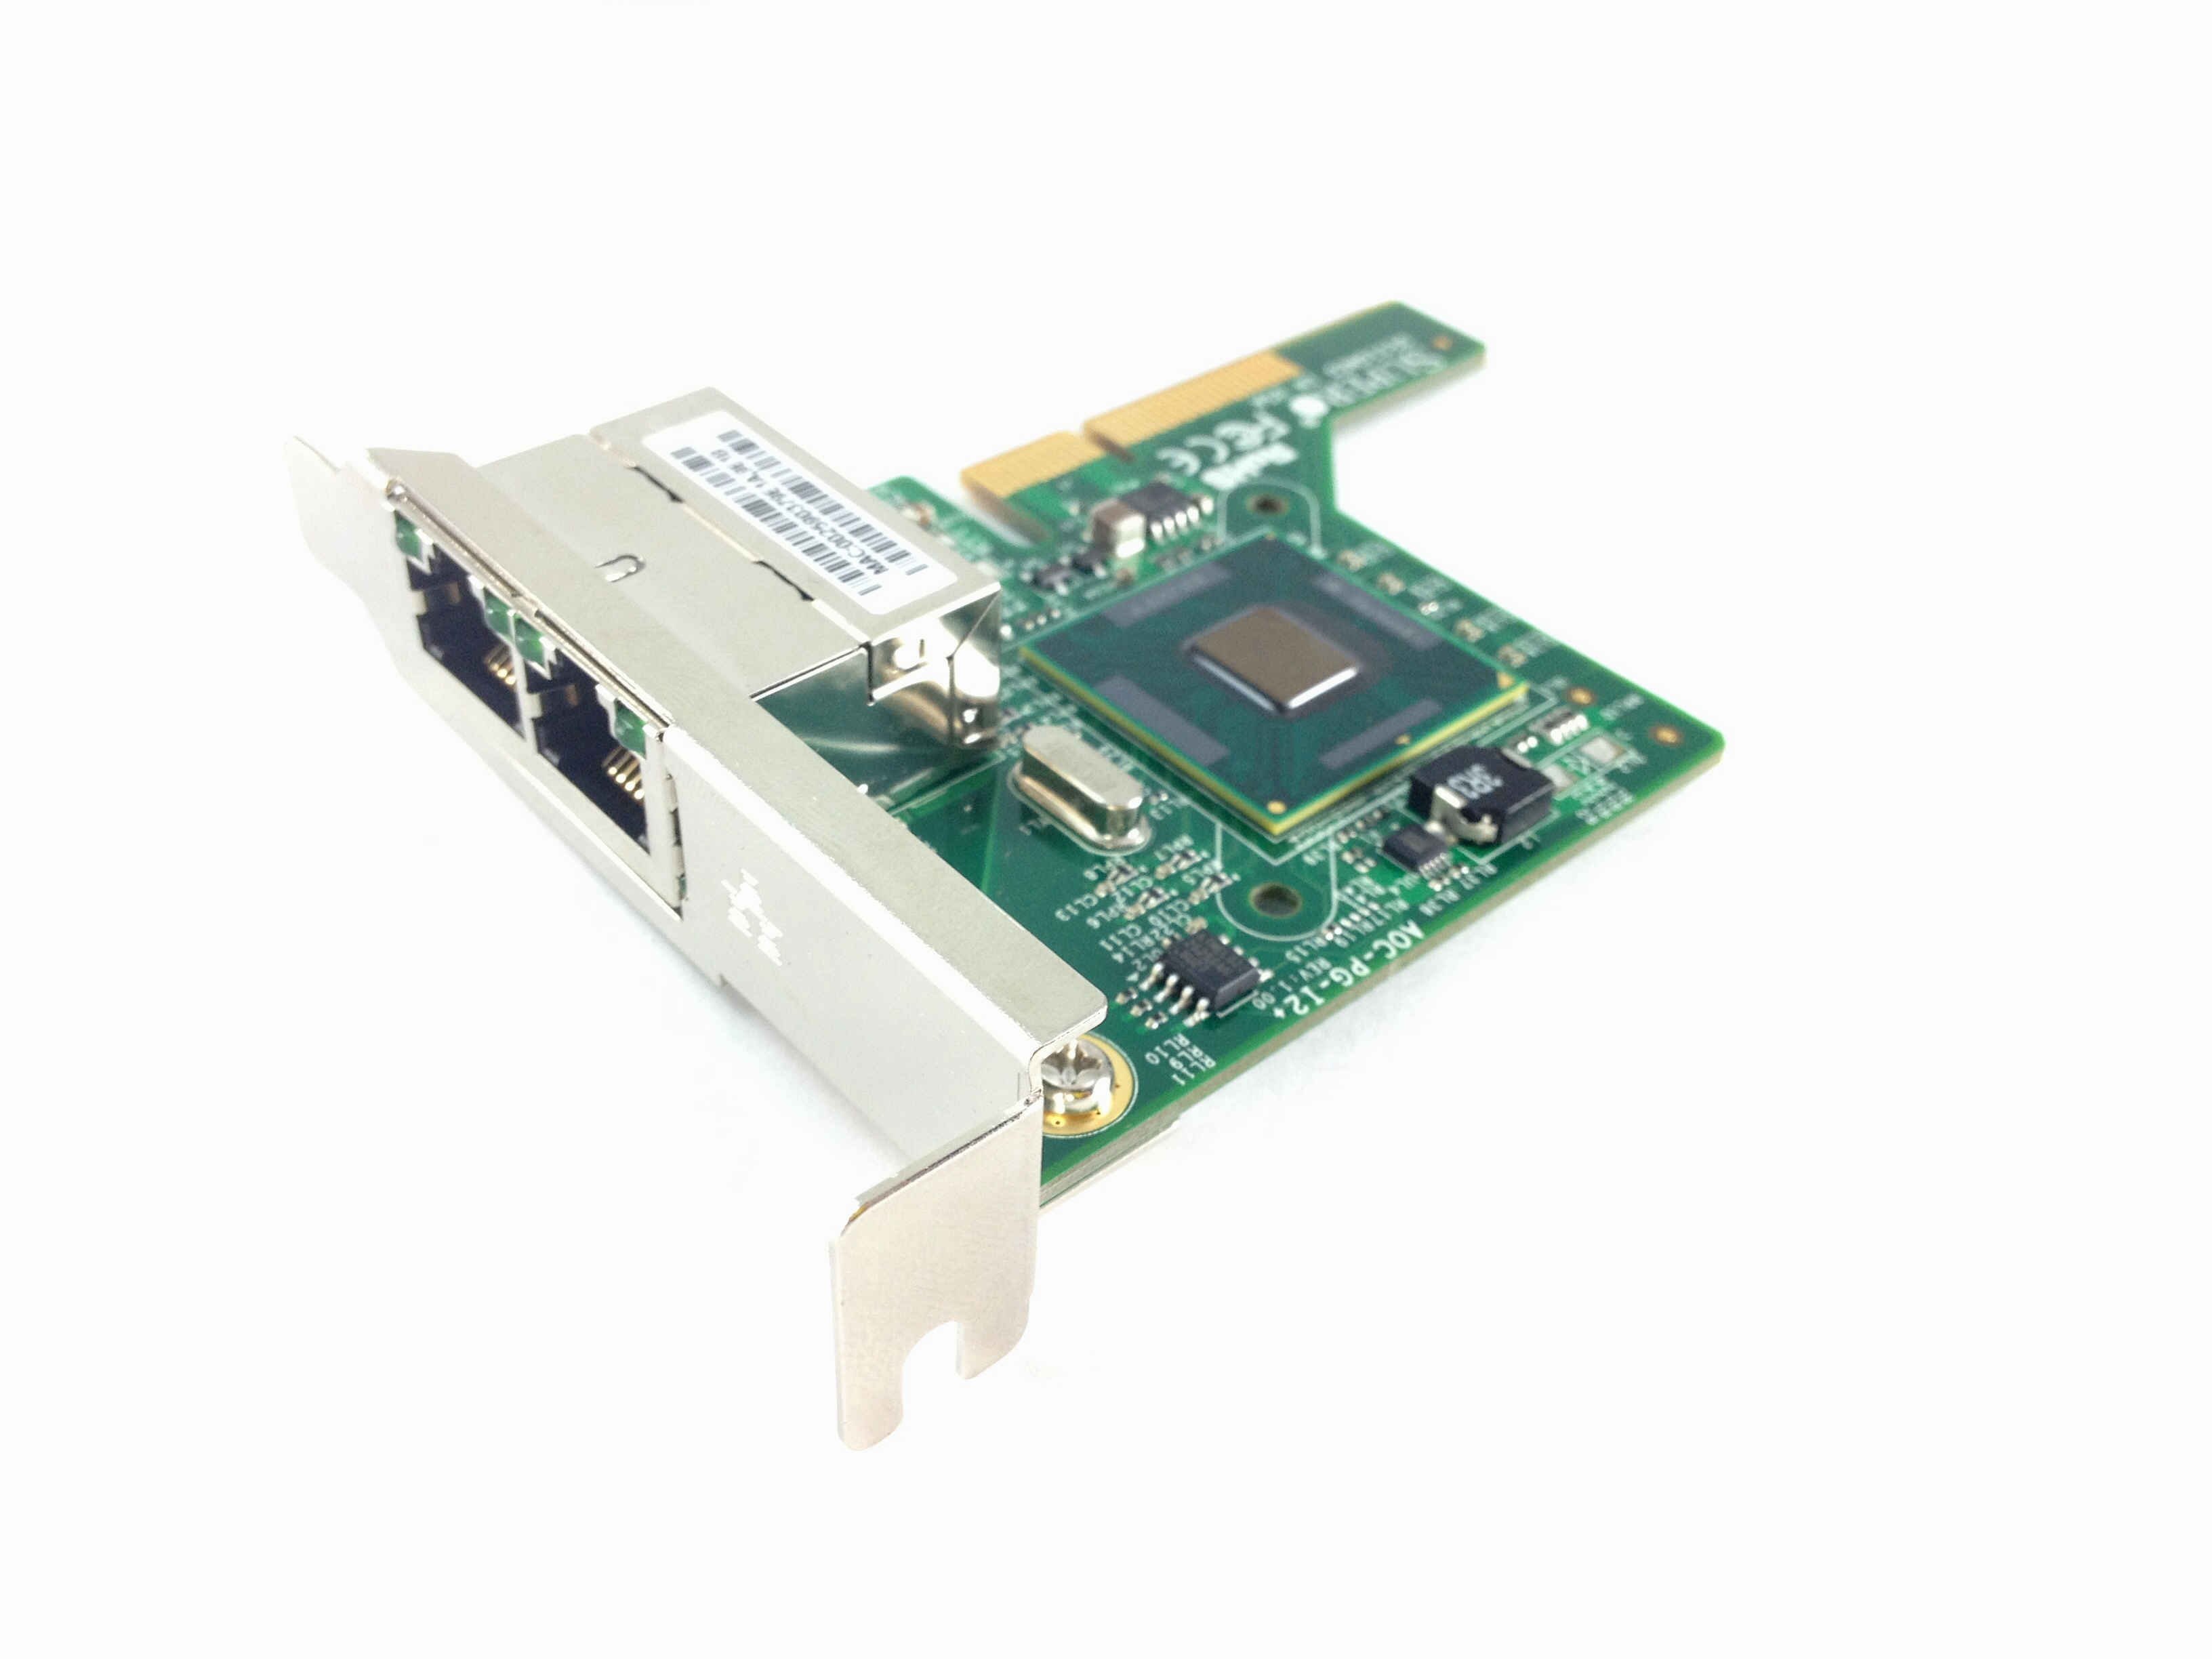 Supermicro AOC-SGP-I2 Dual-Port PCI Gigabit Ethernet PCI Network Adapter